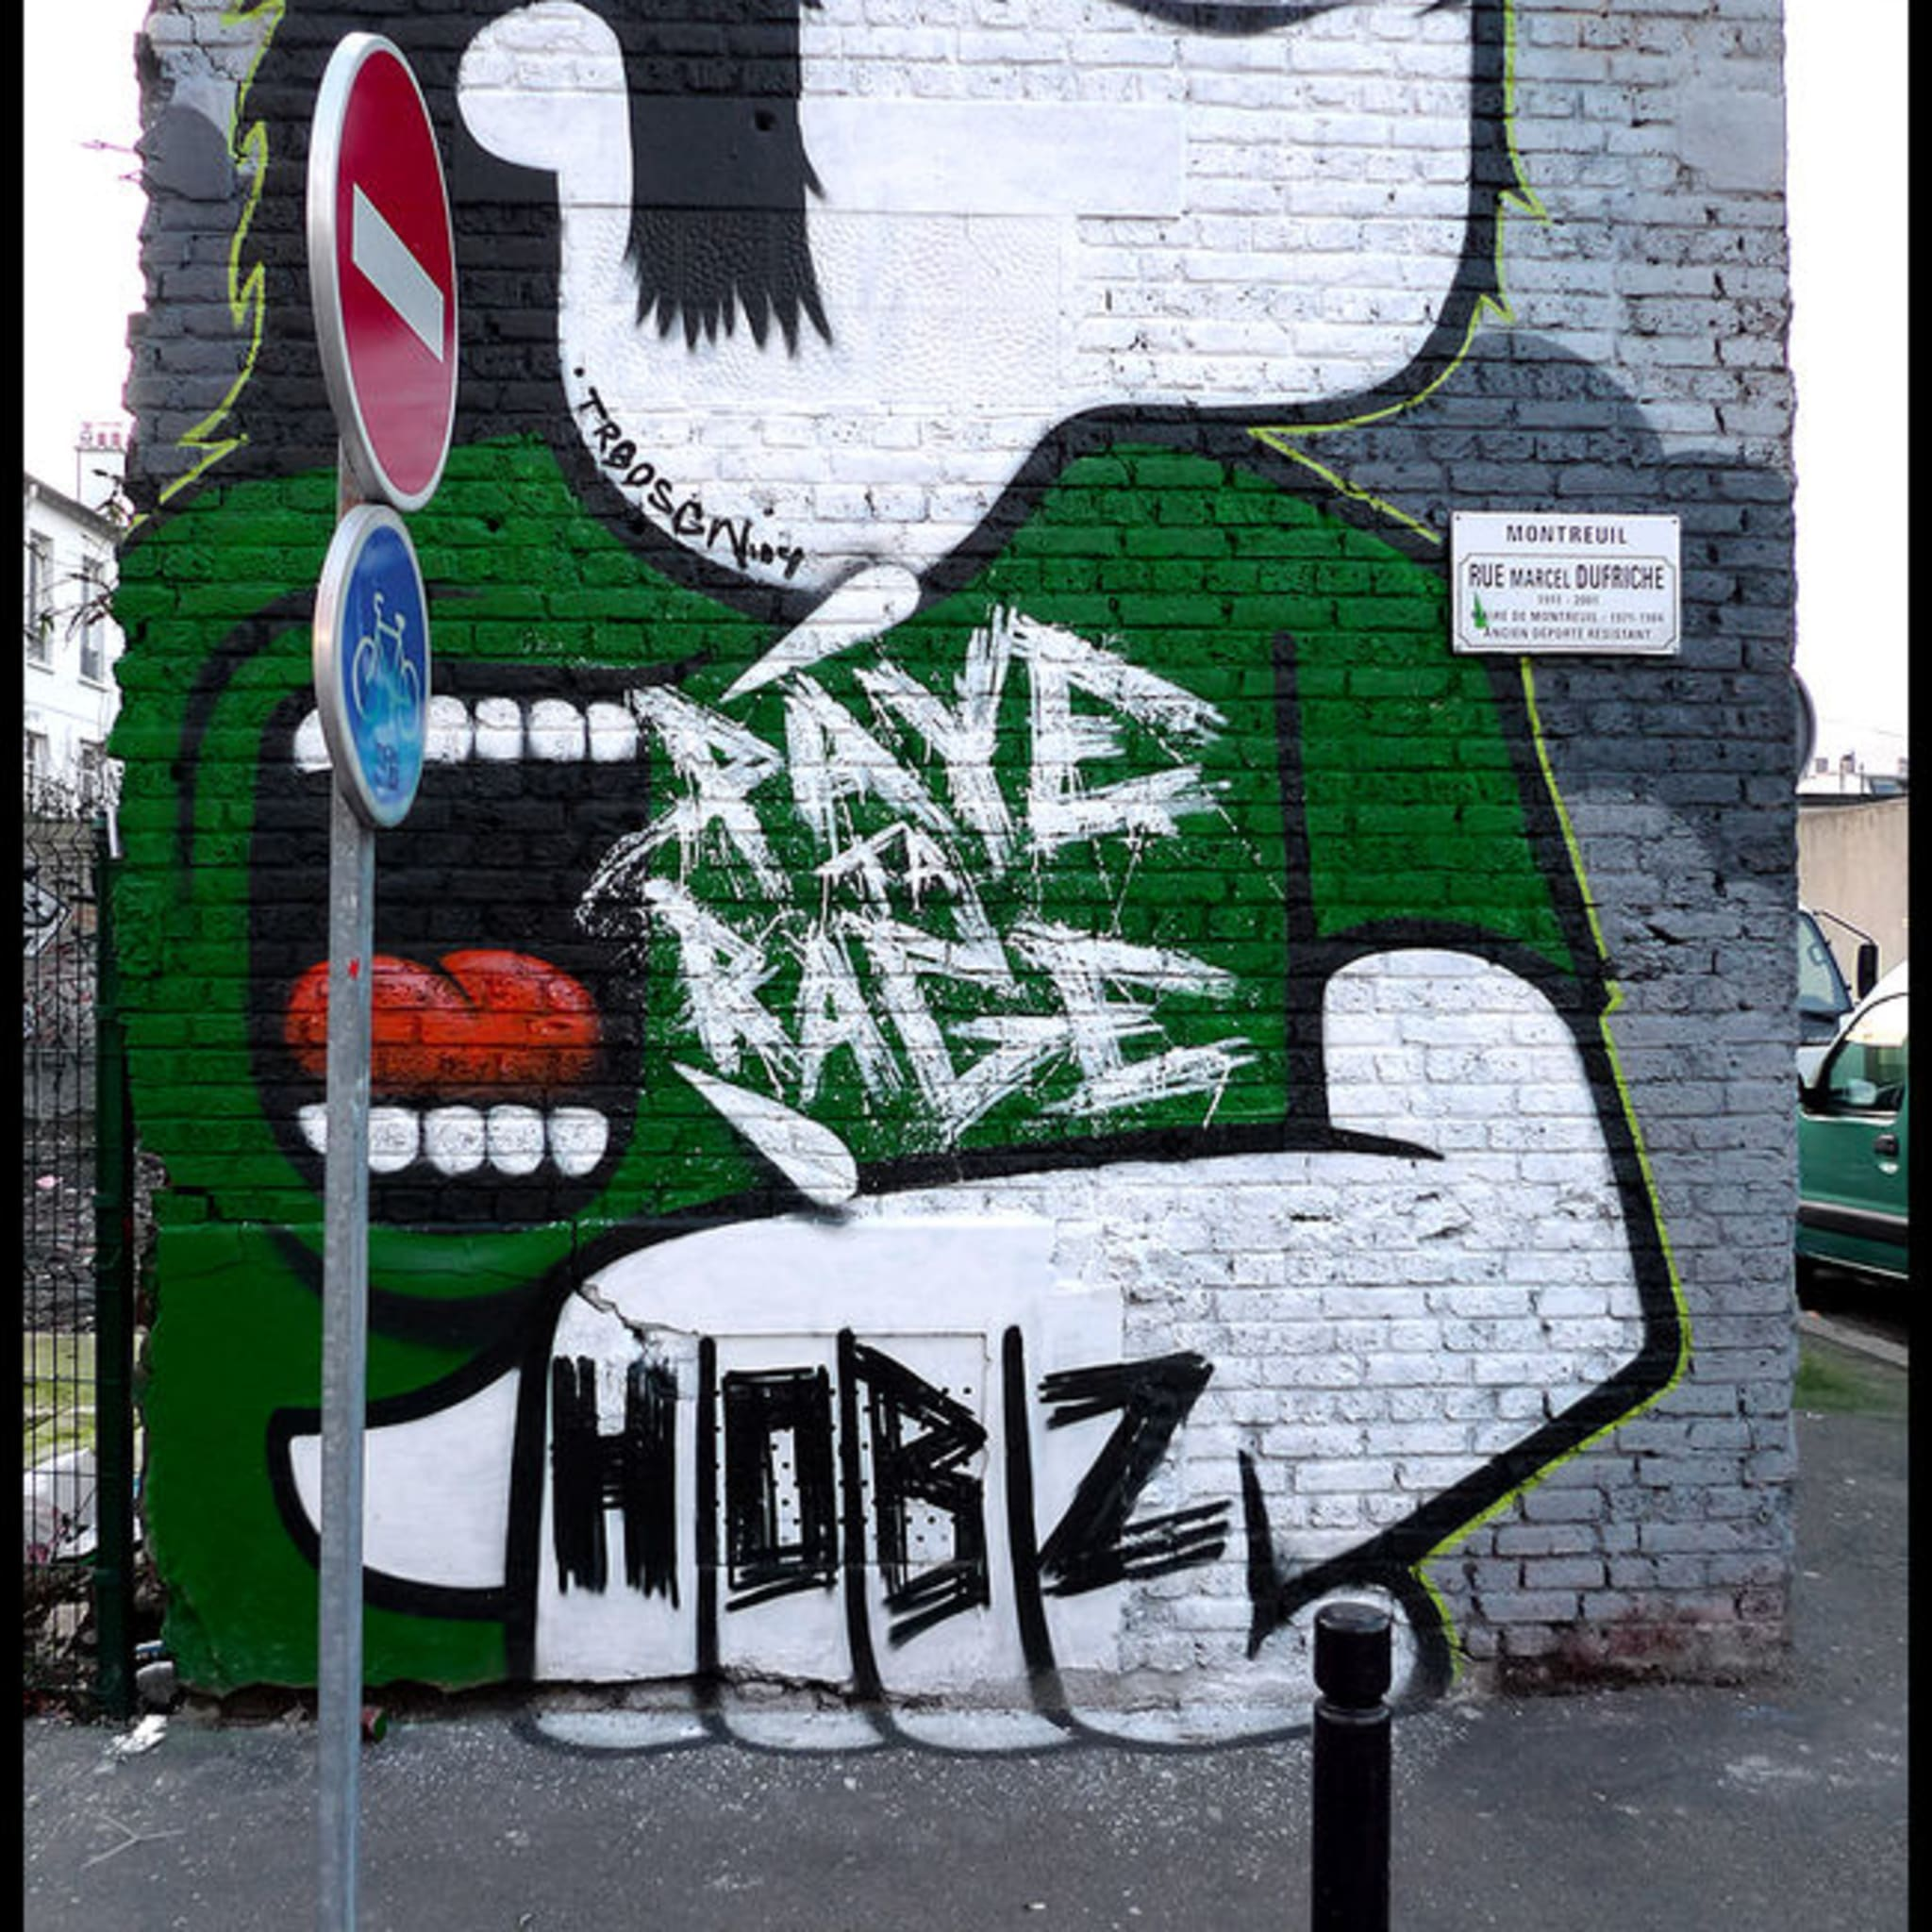 Monsieur Hobz